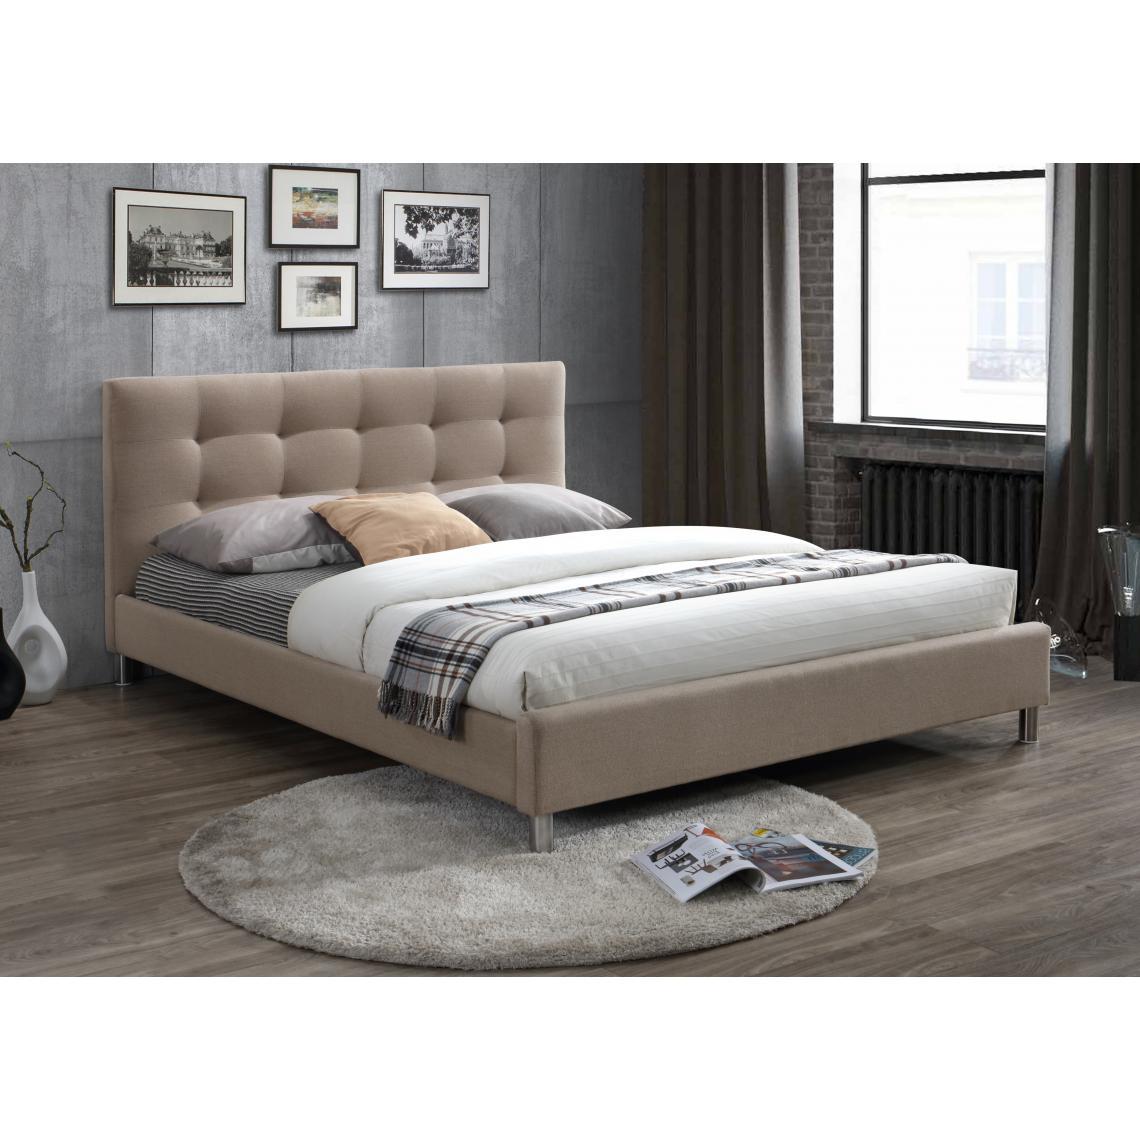 lit beige 160 en tissu avec tete de lit capitonnee eva